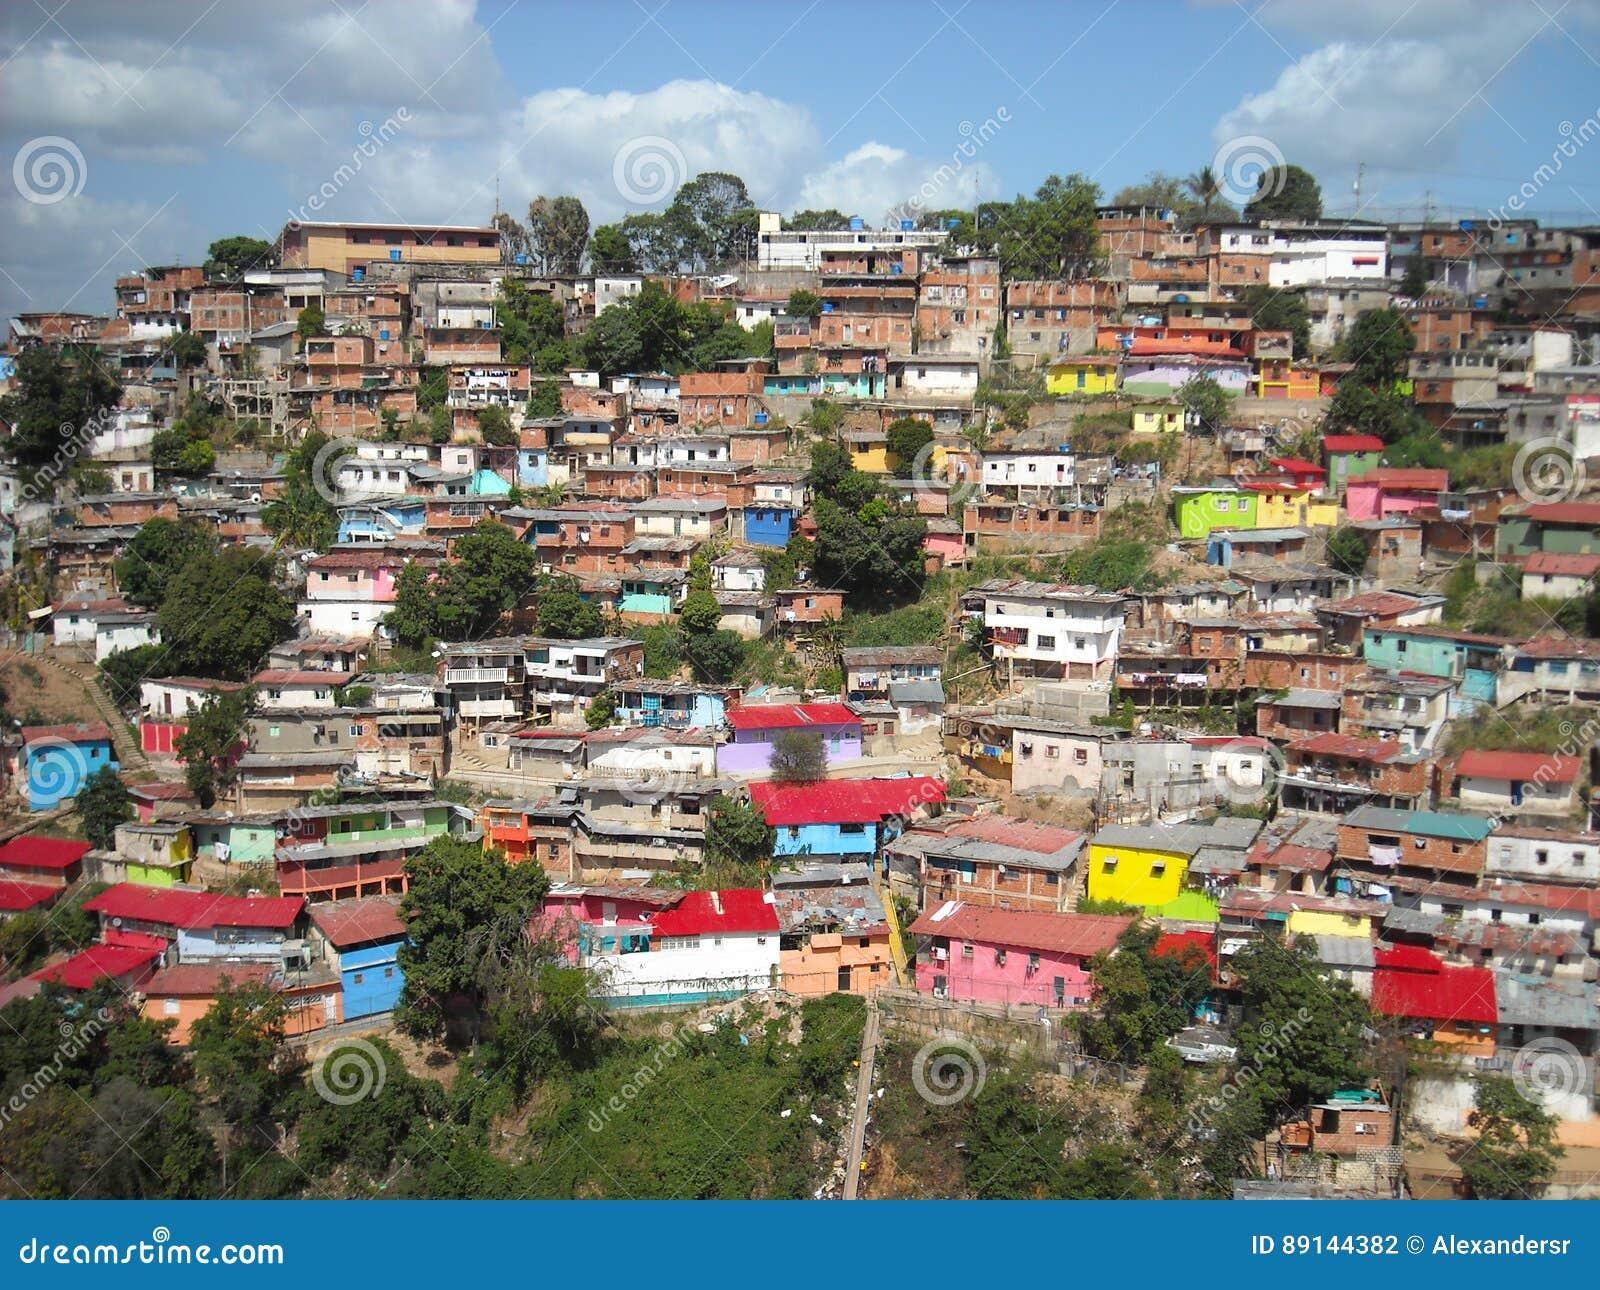 Slum on hills,Caracas, Venezuela